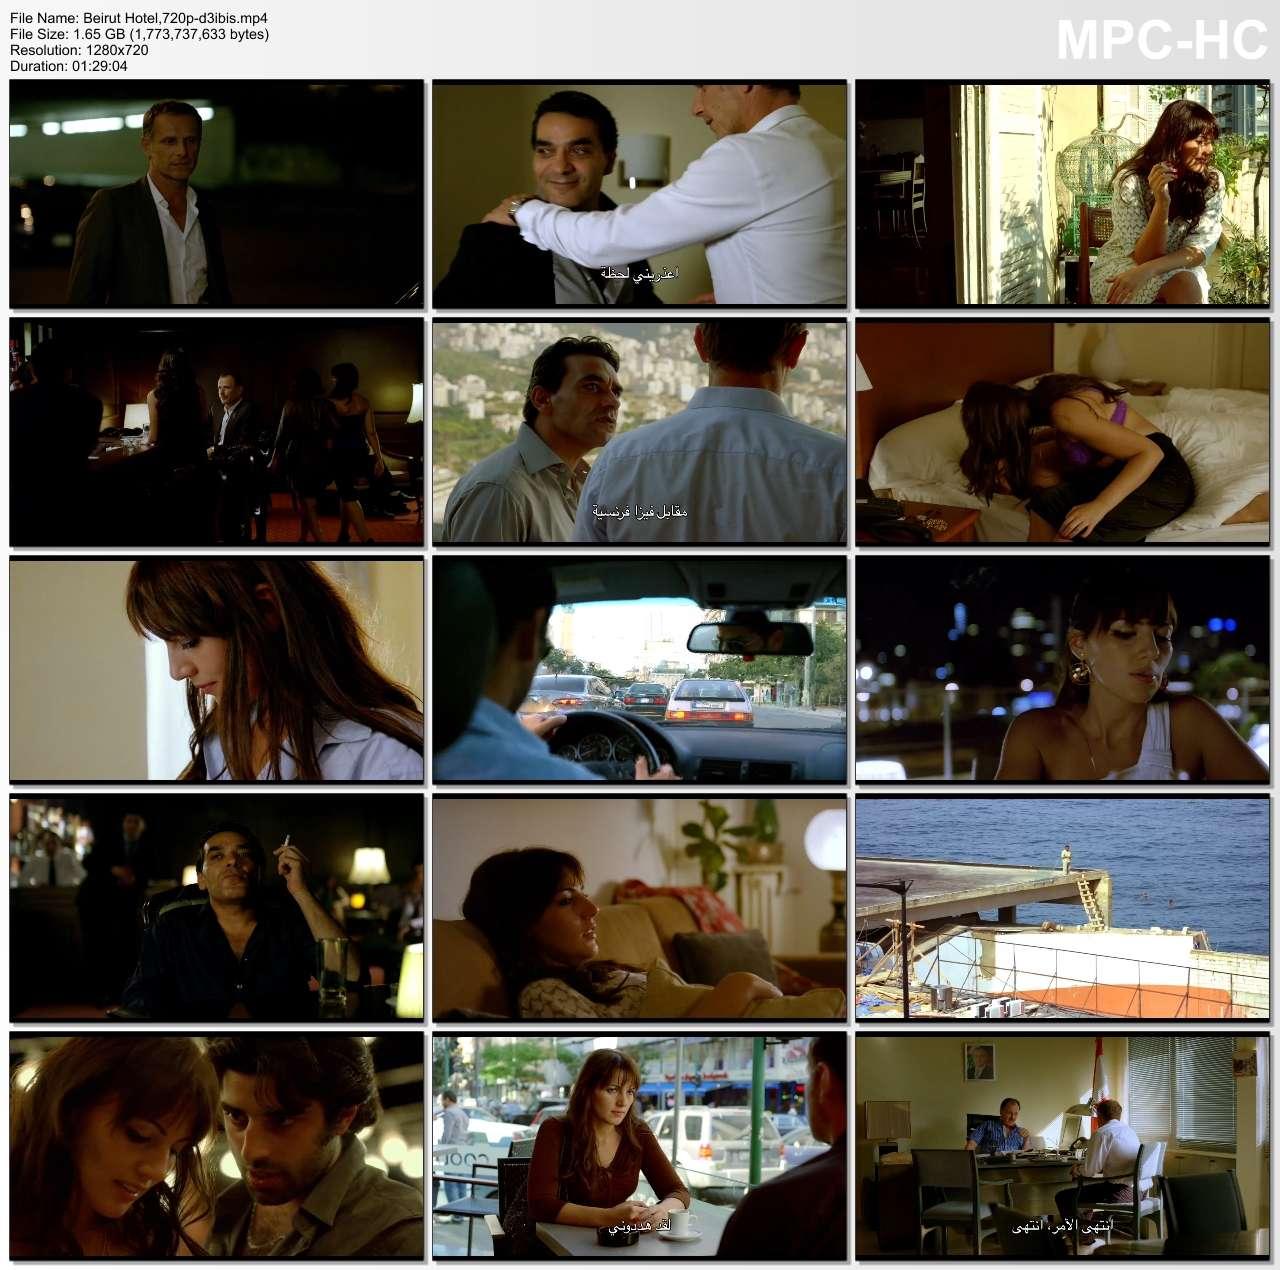 [فيلم][تورنت][تحميل][فندق بيروت][2011][720p][HDTV][لبناني] 10 arabp2p.com